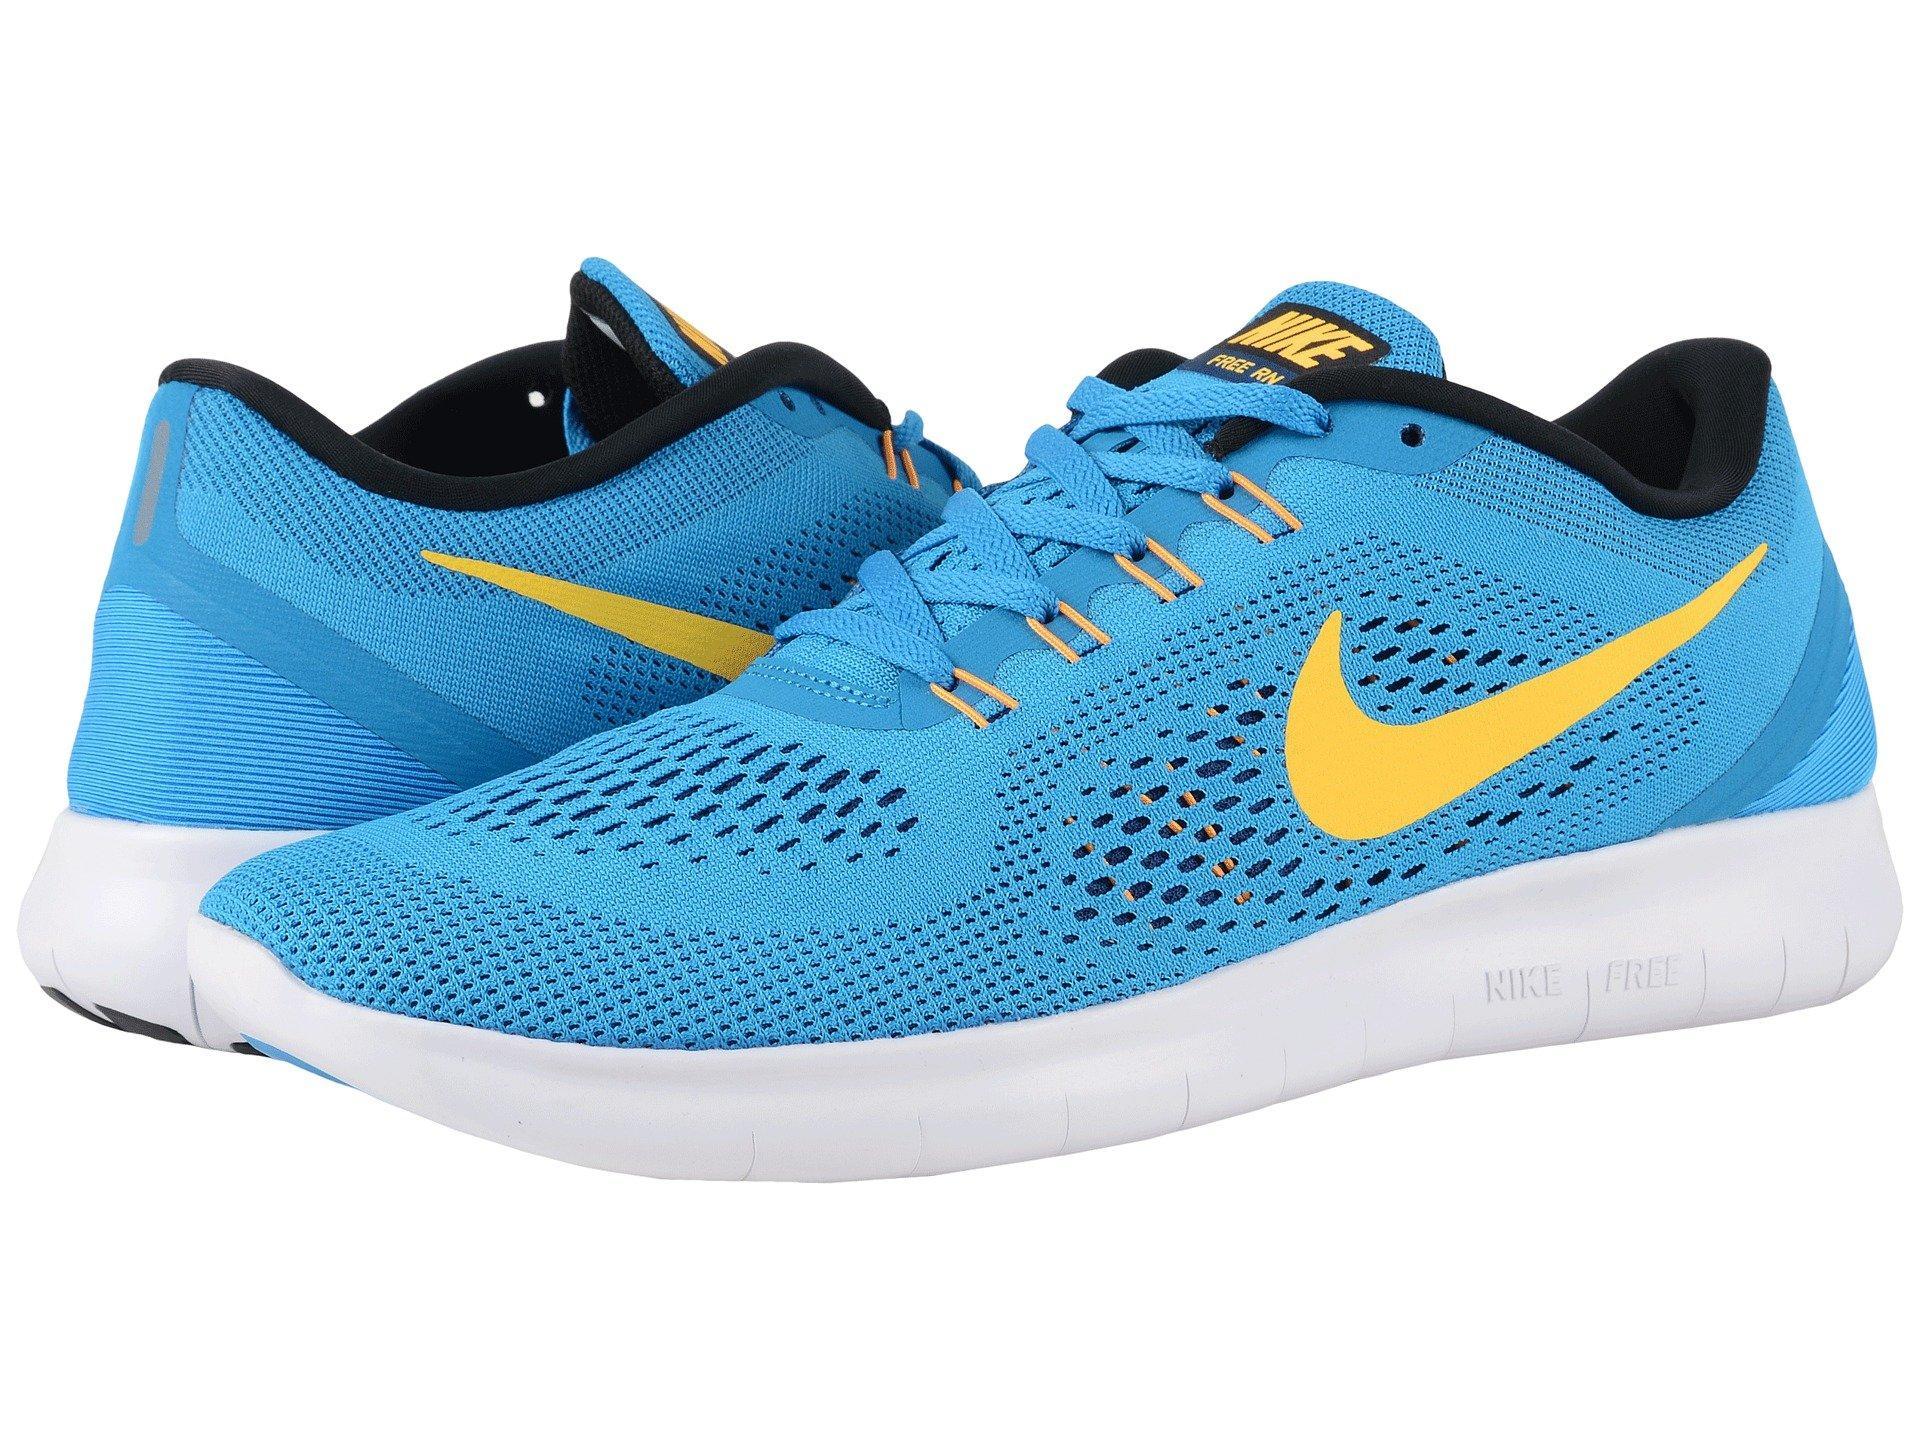 watch 61c48 43fdb Nike Free Rn, Heritage Cyan Black Blue Spark Laser Orange